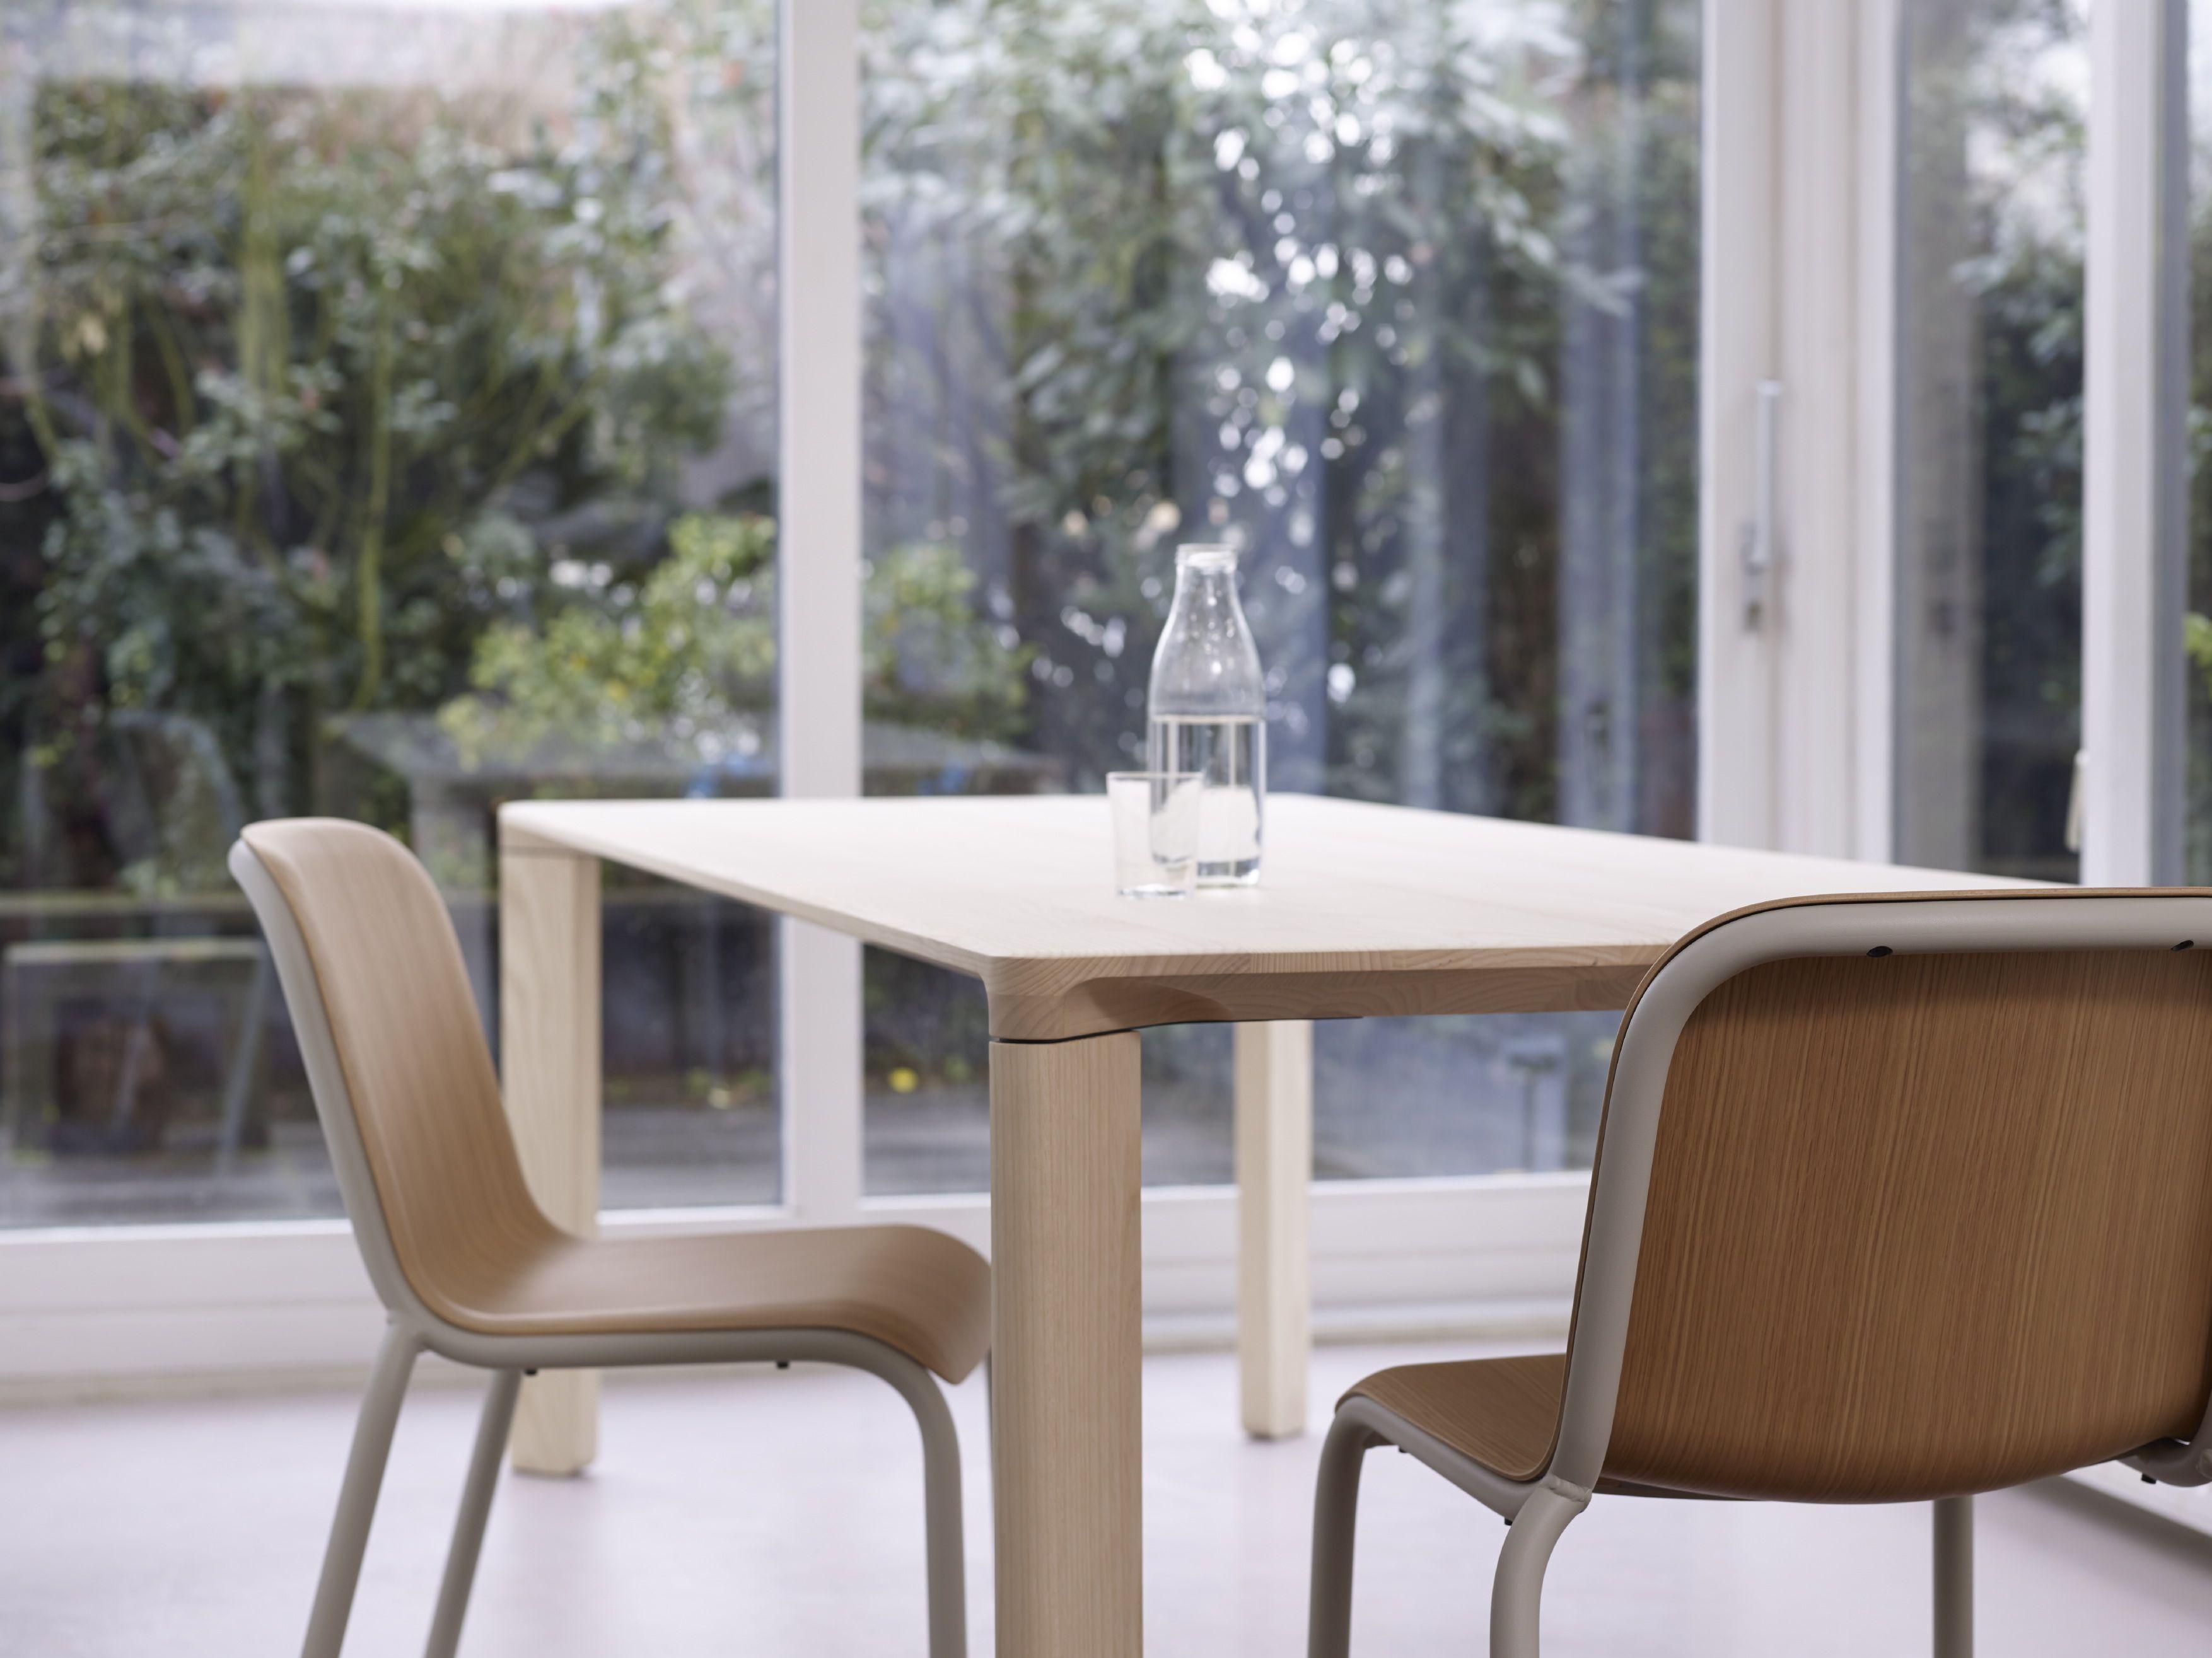 Eettafel Stoelen Gamma.Joy Gamma Fresh Clean Design A Collection Of Solid Wooden